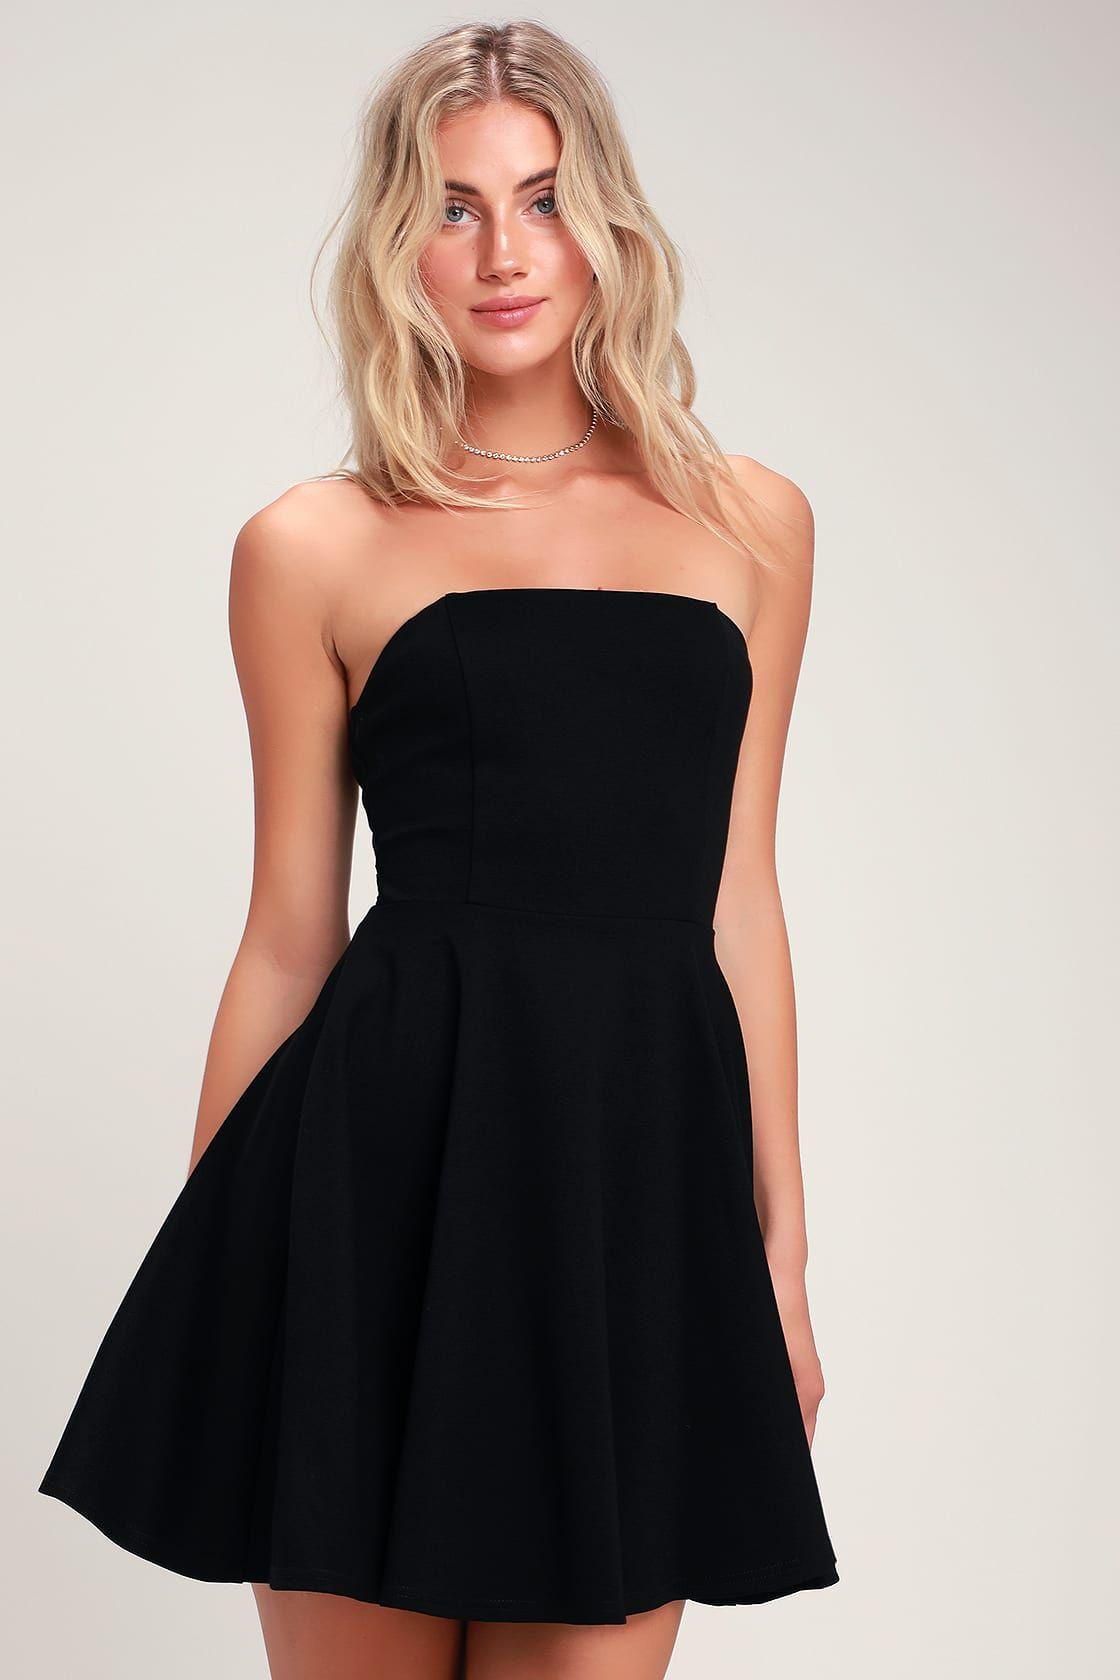 About A Twirl Black Strapless Skater Dress Black Long Sleeve Dress Strapless Dresses Short Cute Black Dress [ 1680 x 1120 Pixel ]